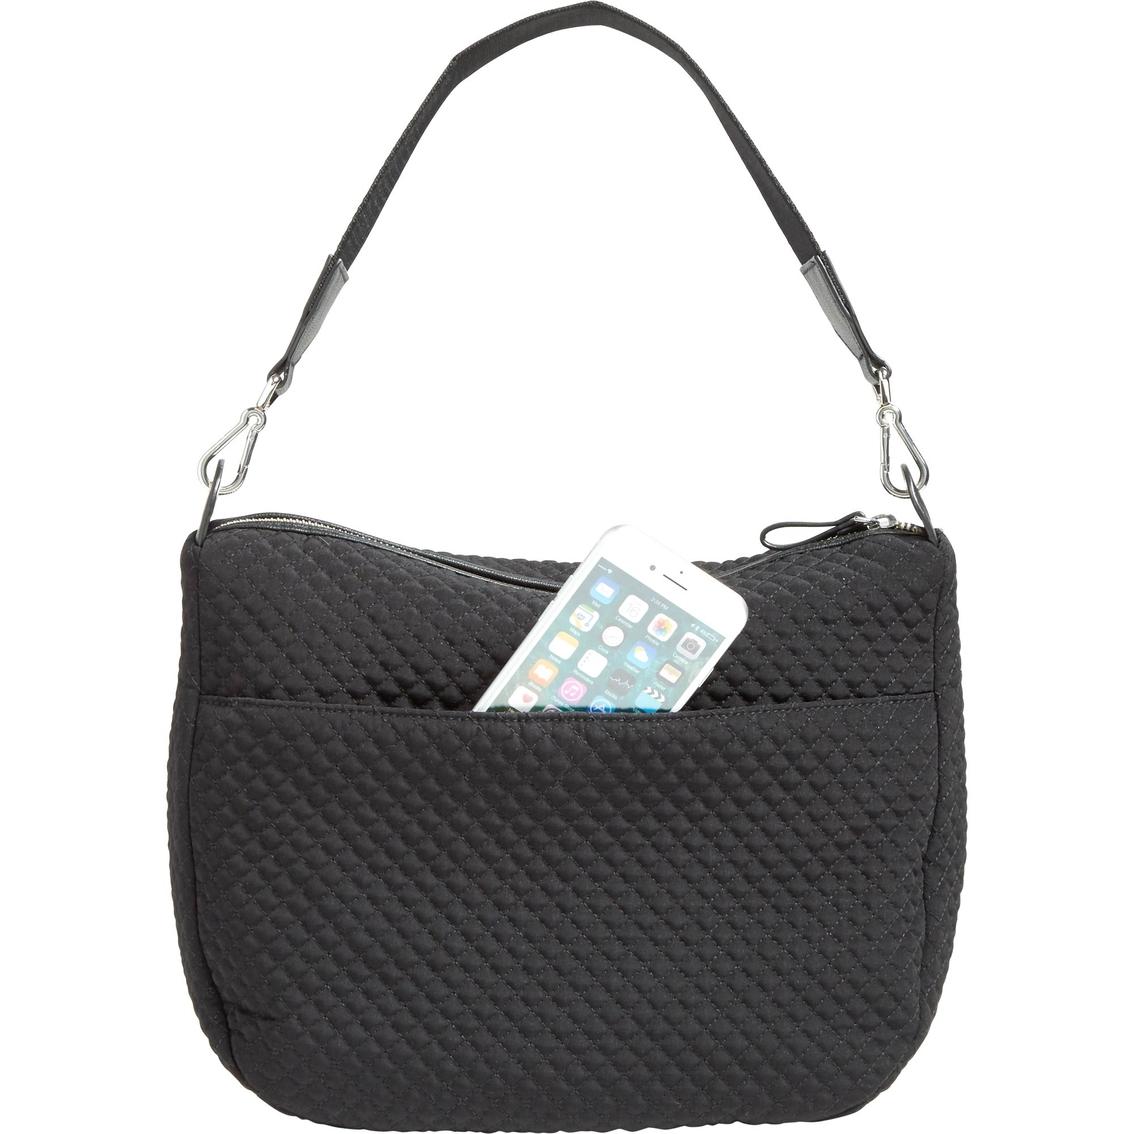 Vera Bradley Carson Shoulder Bag   Shop By Pattern   Shop The Exchange ad63abfd5c